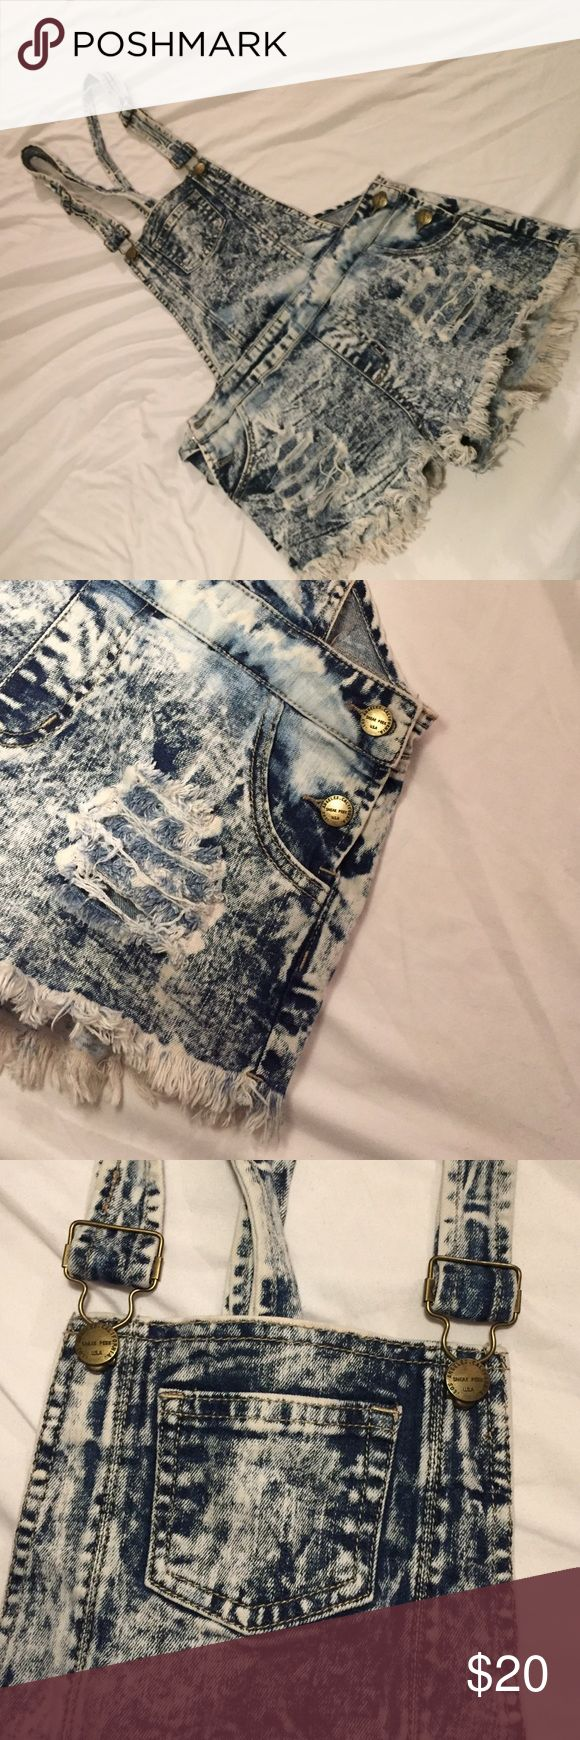 Distress Denim Acid Wash Overall Shorts Sexy denim overall shorts. 5 pockets Charlotte Russe Shorts Jean Shorts